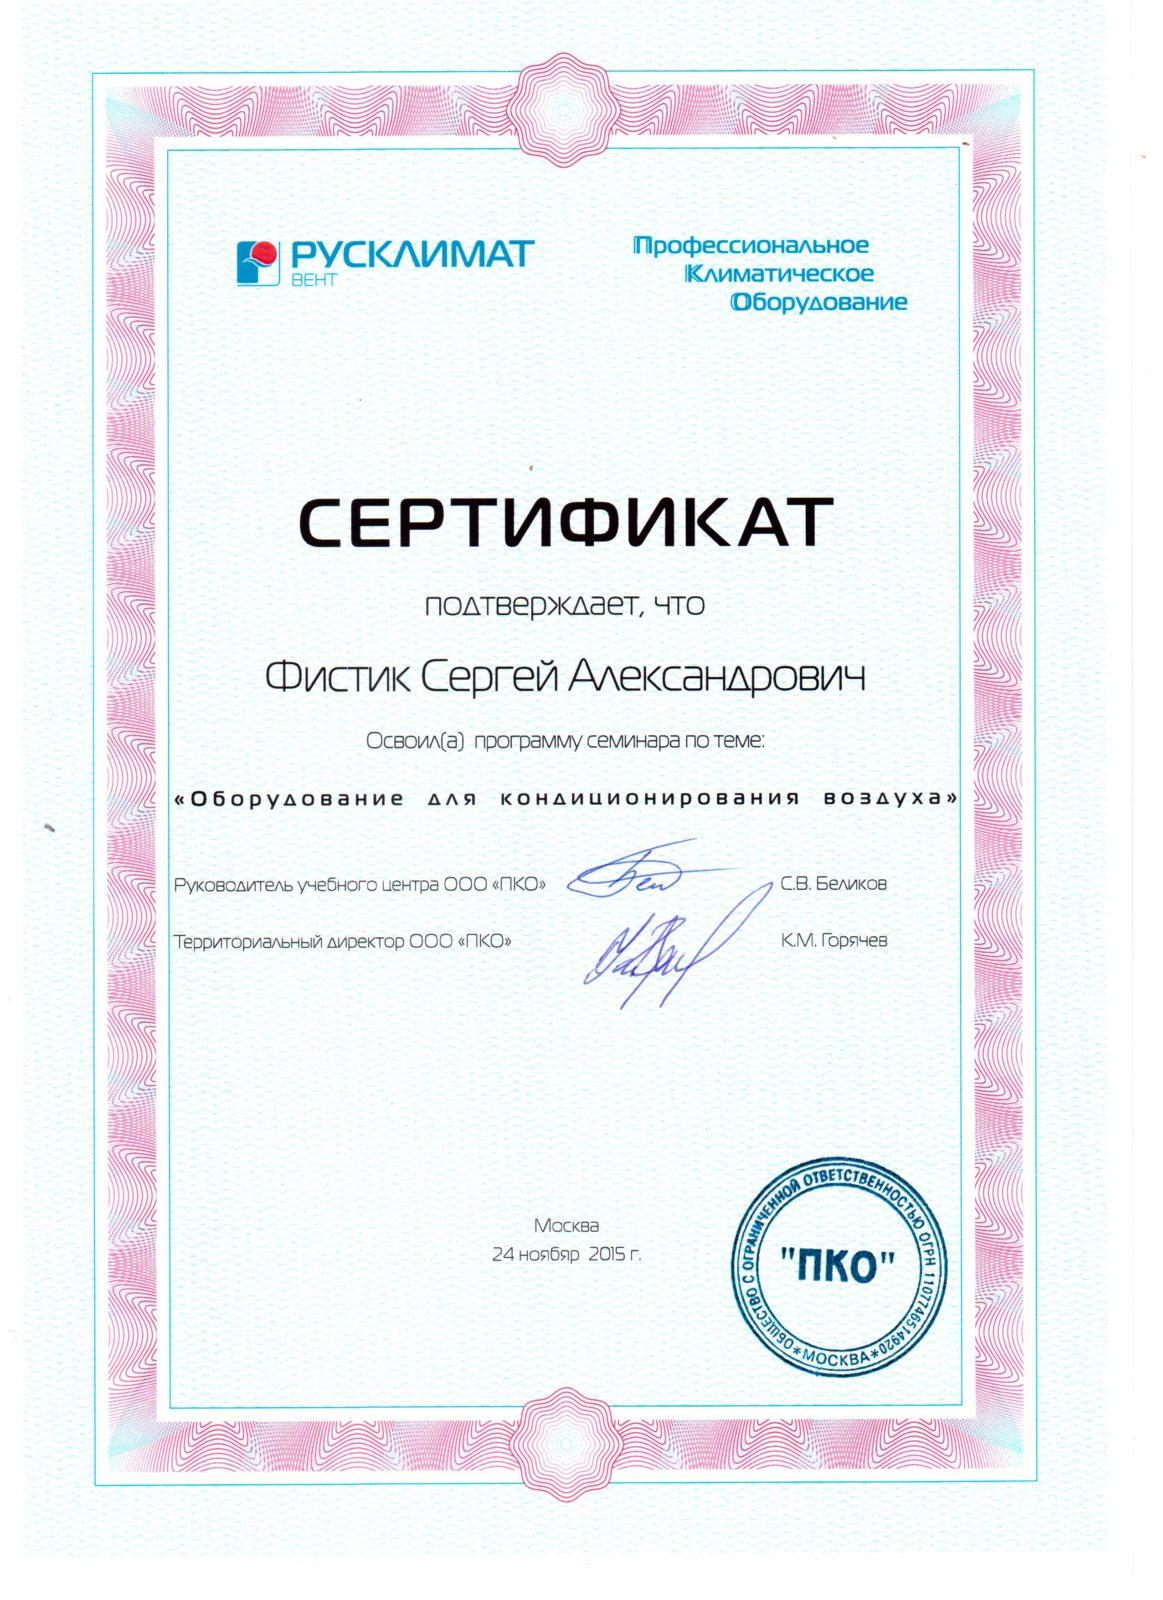 Сертификат Русклимата